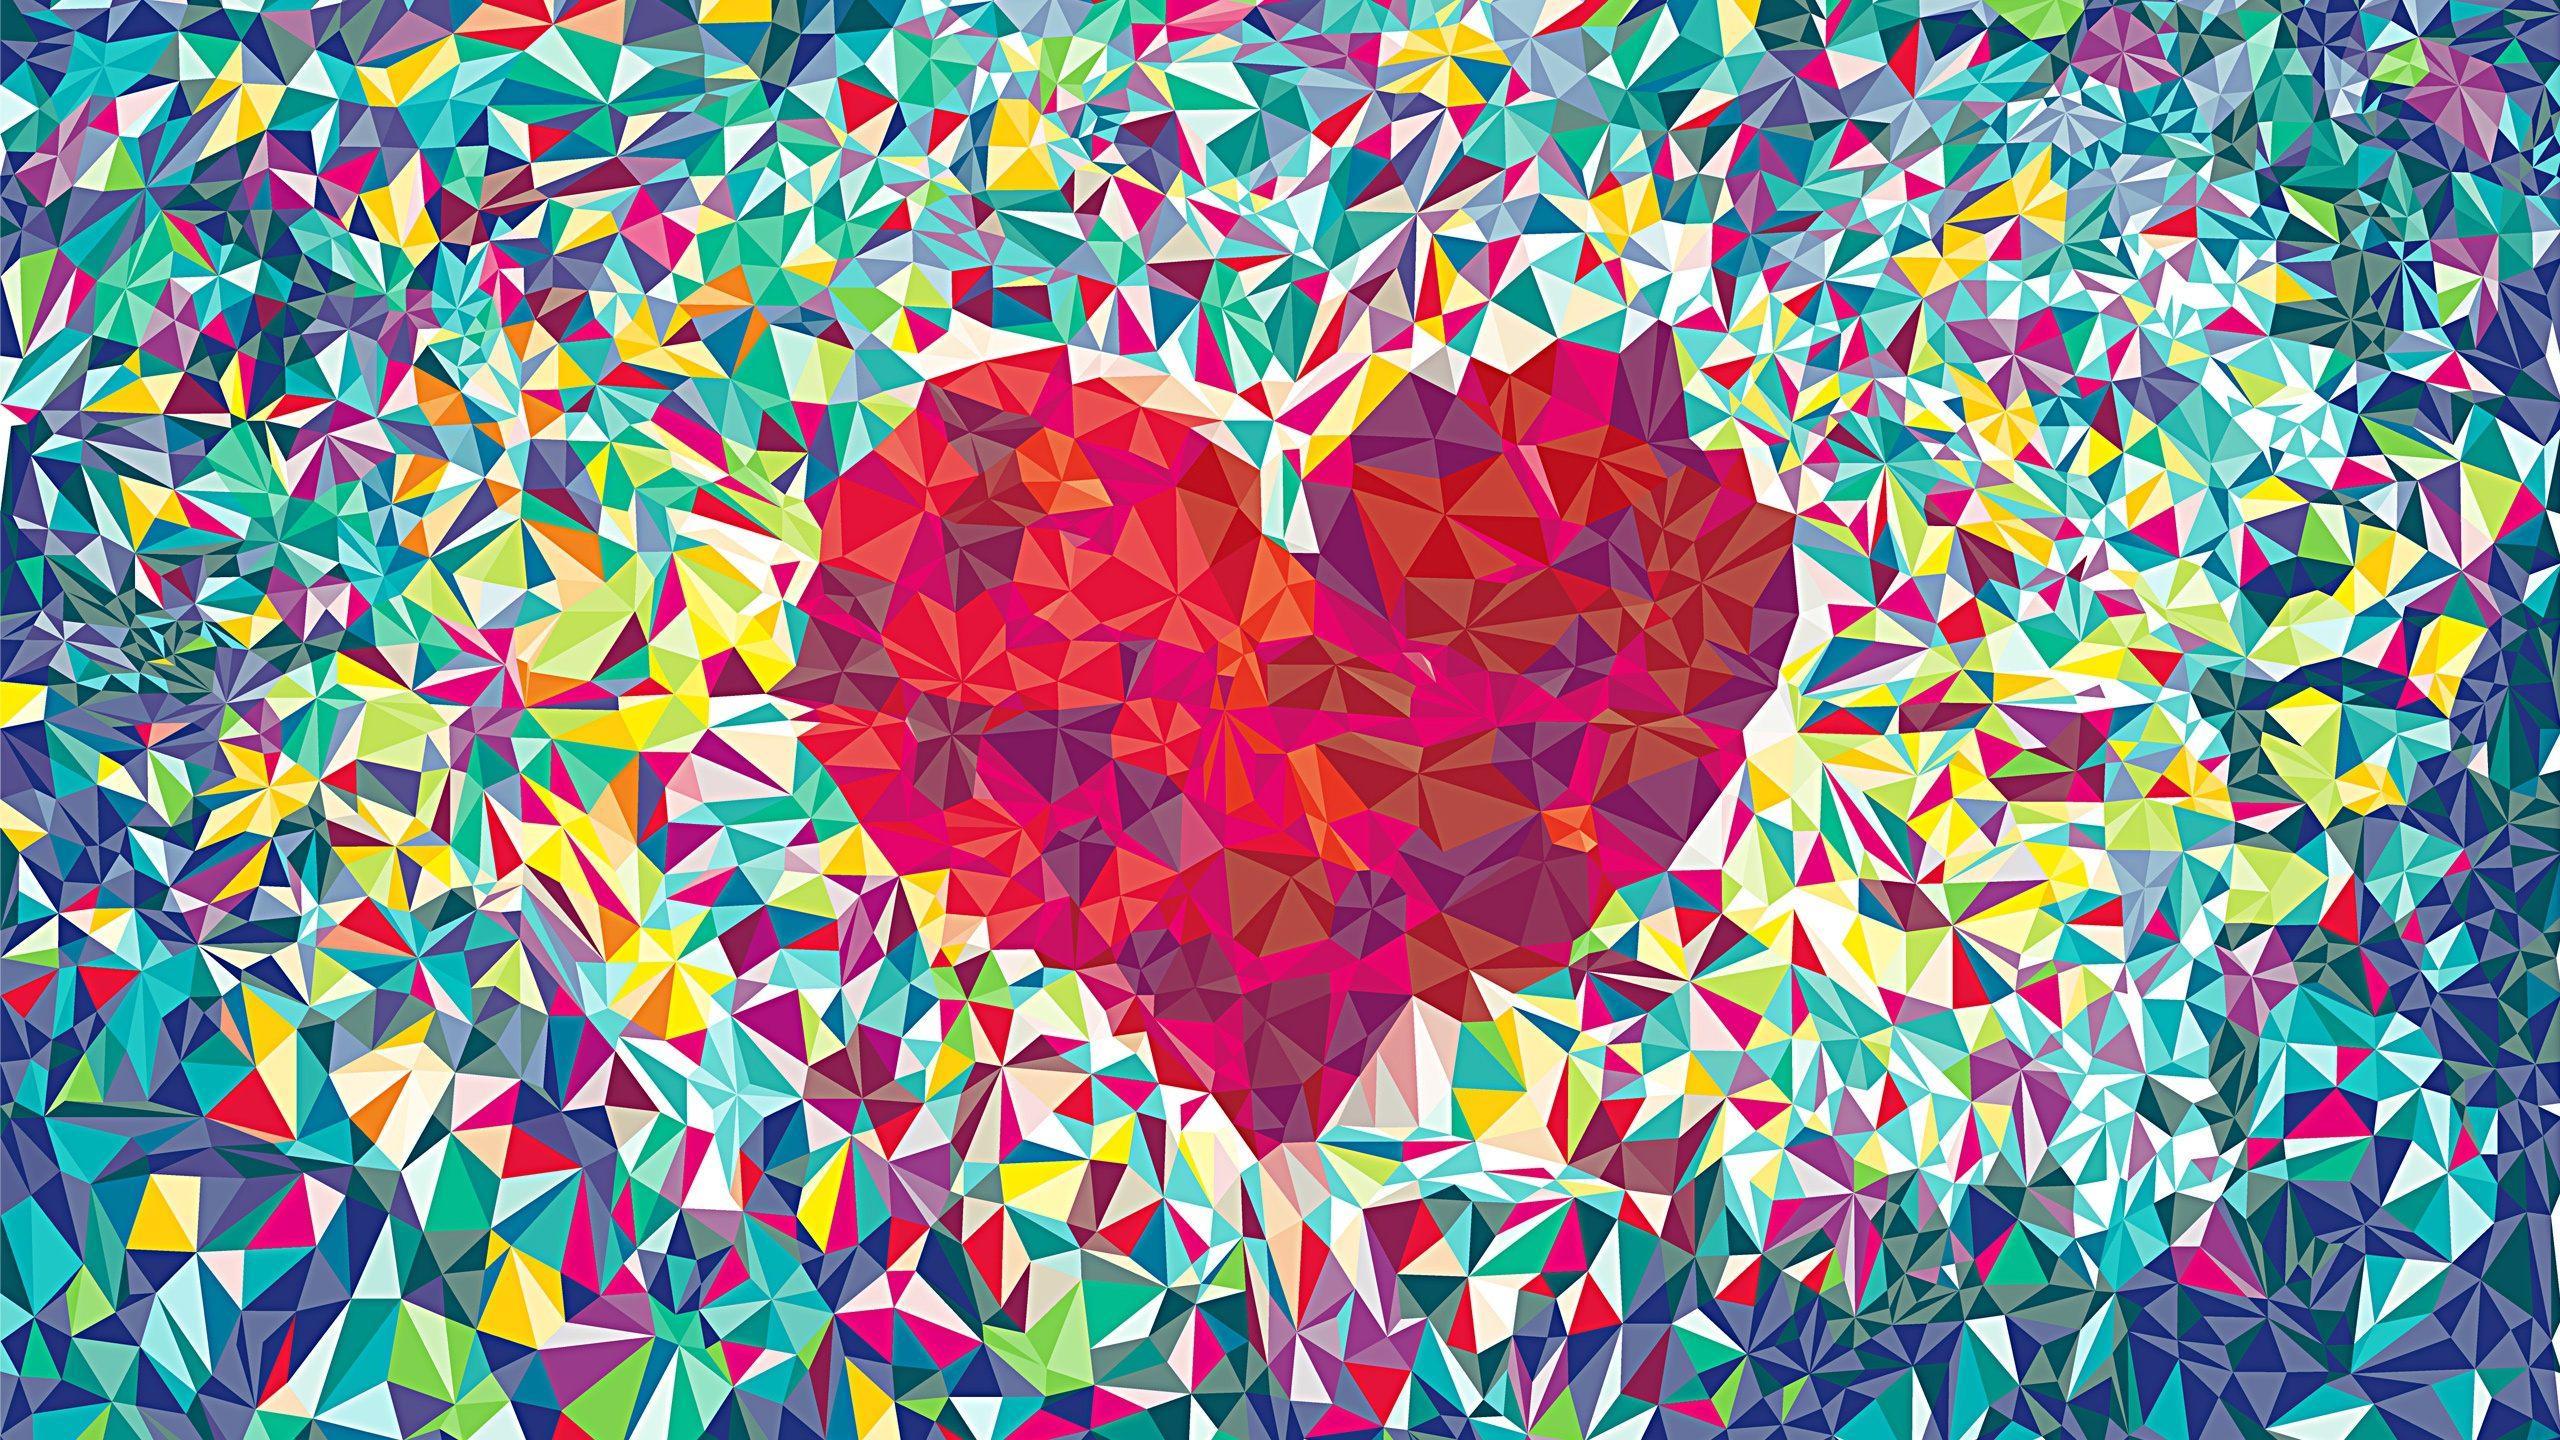 Colour Full Hd Wallpaper   K Pop Background 4505   HD Wallpaper 2560x1440